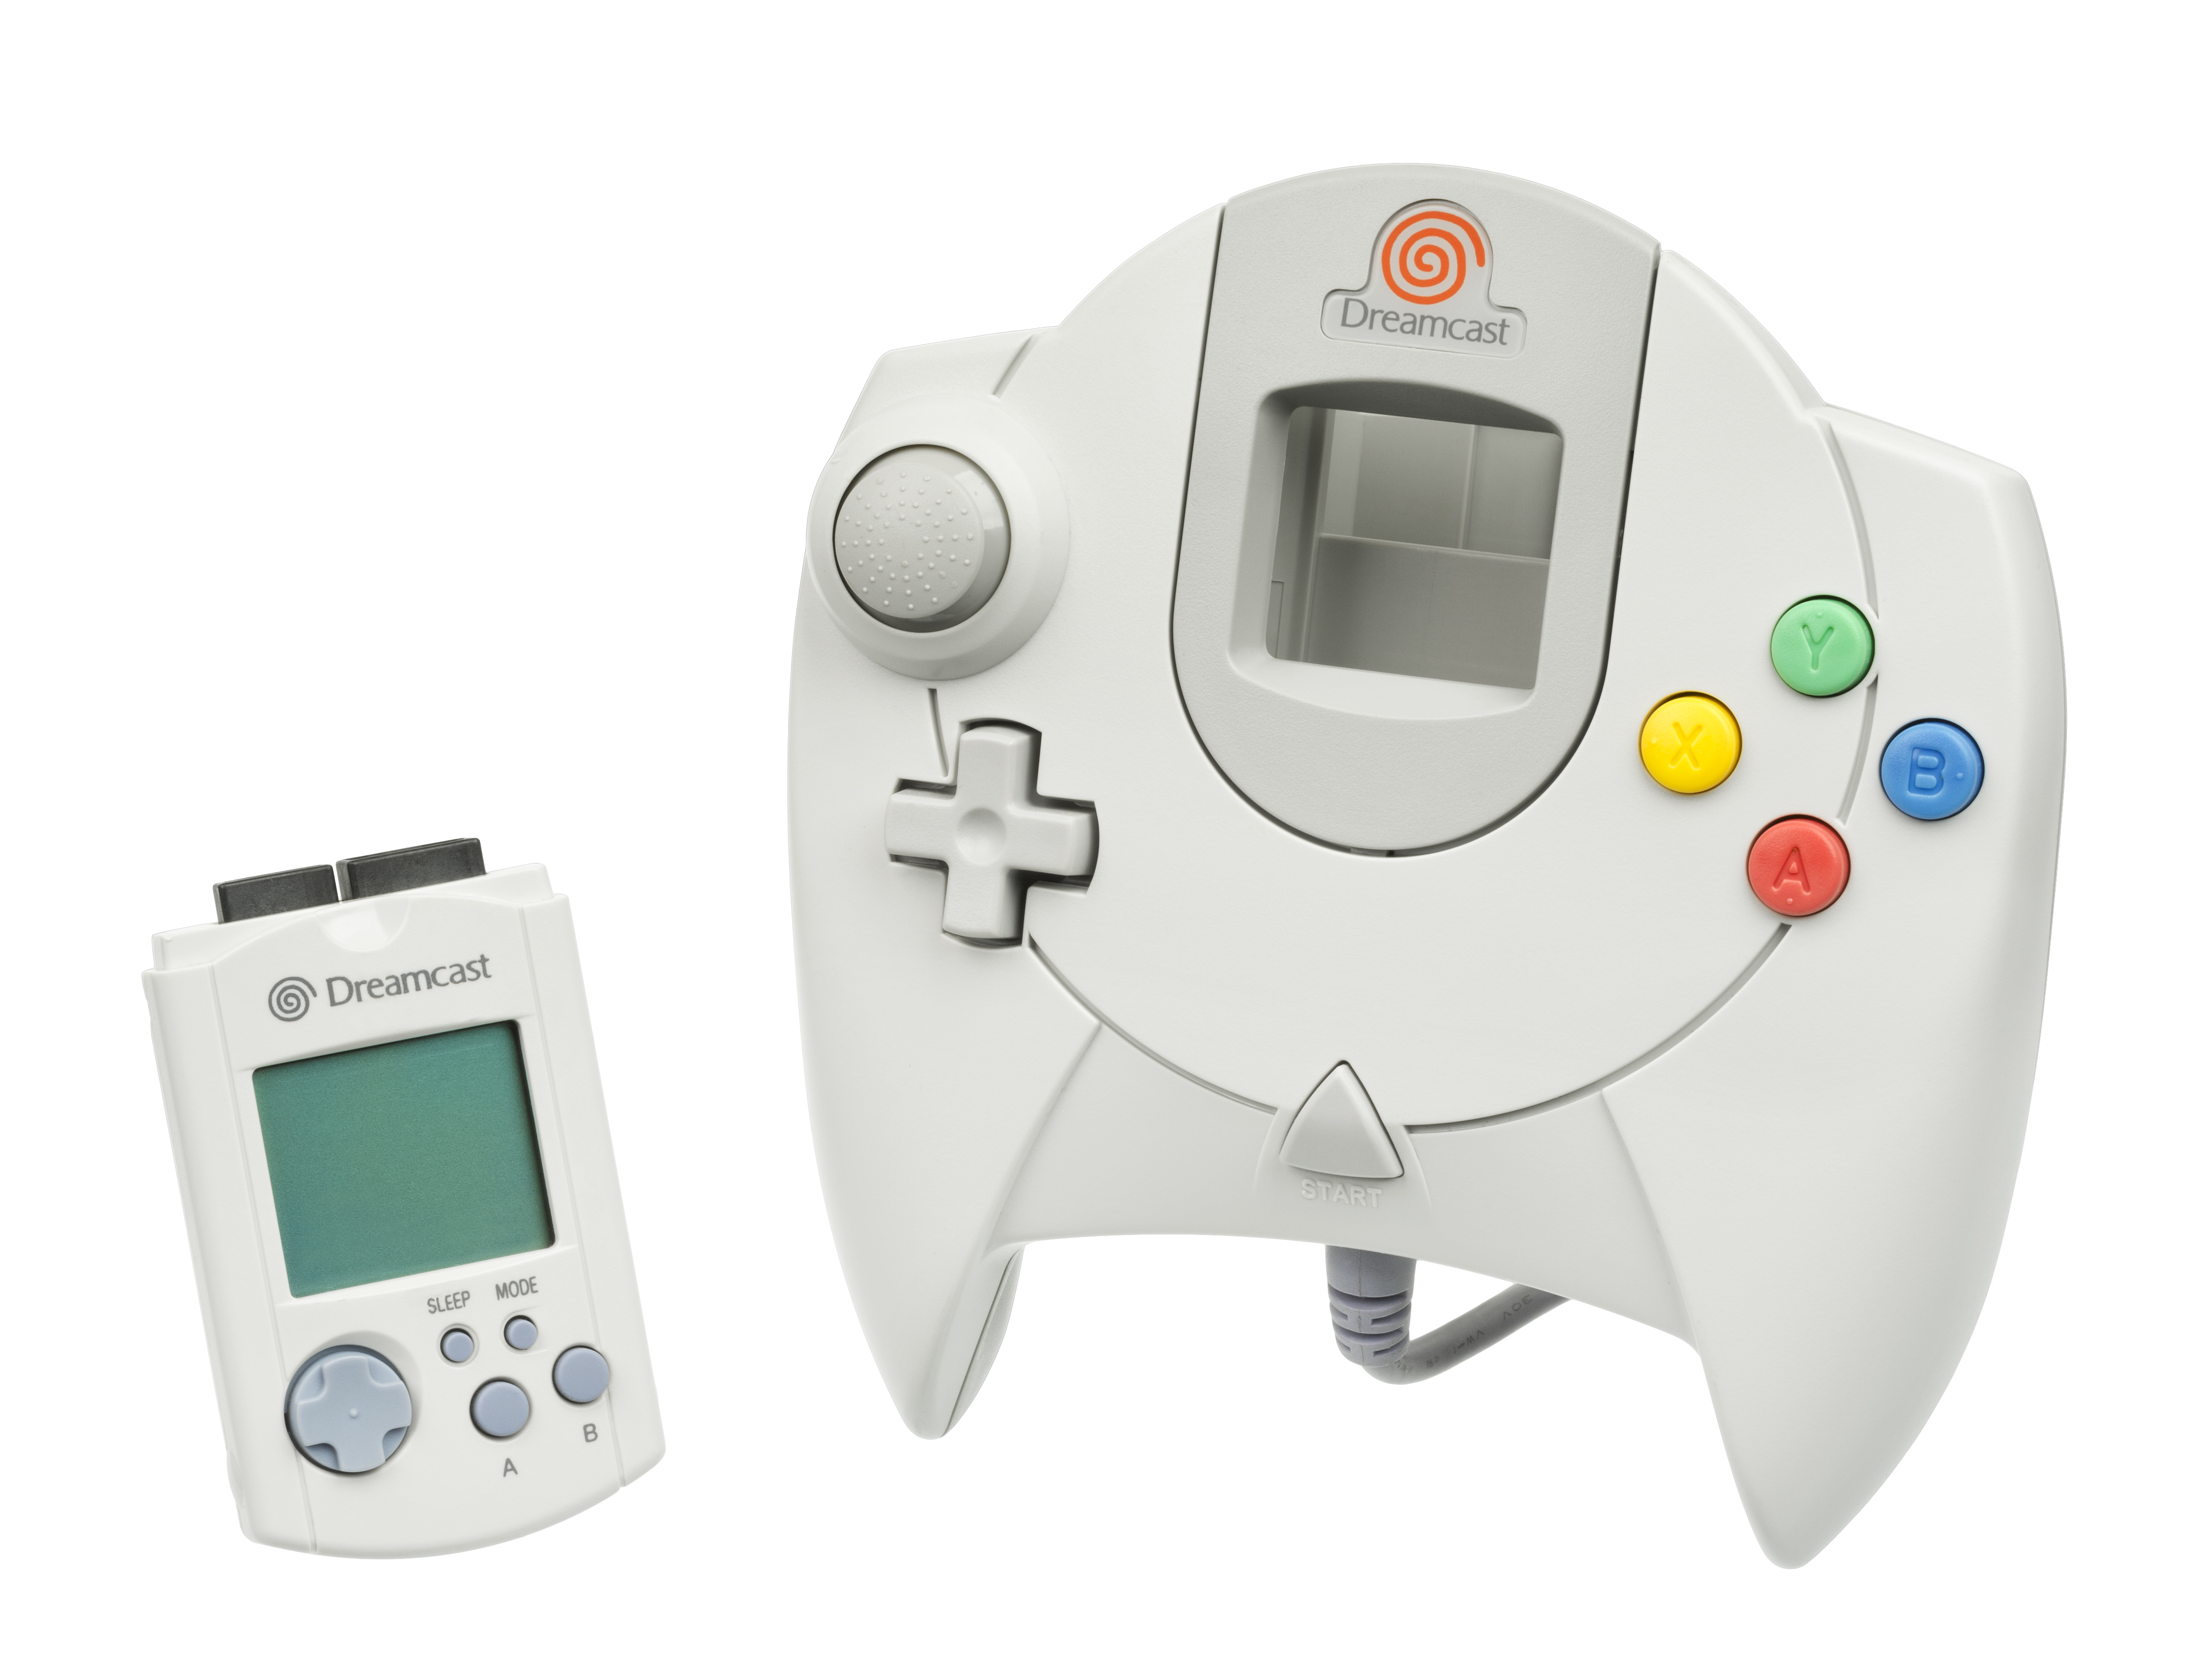 Dreamcast 2 Release Date Sega zip drive 2